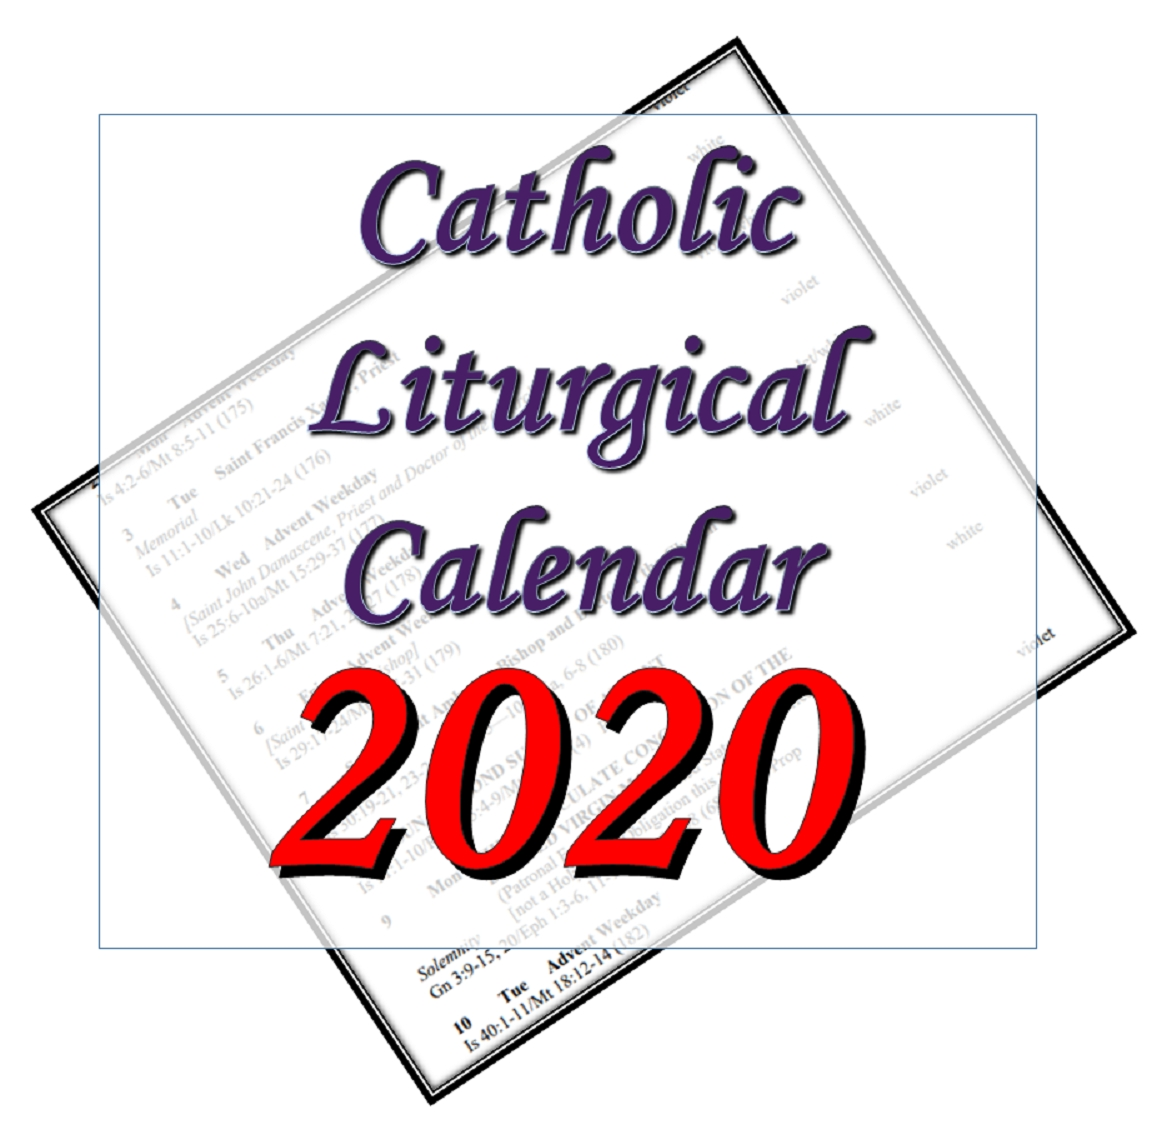 Liturgytools: Catholic Liturgical Calendars For 2020 intended for Liturgical Calendar For Yearr 2020